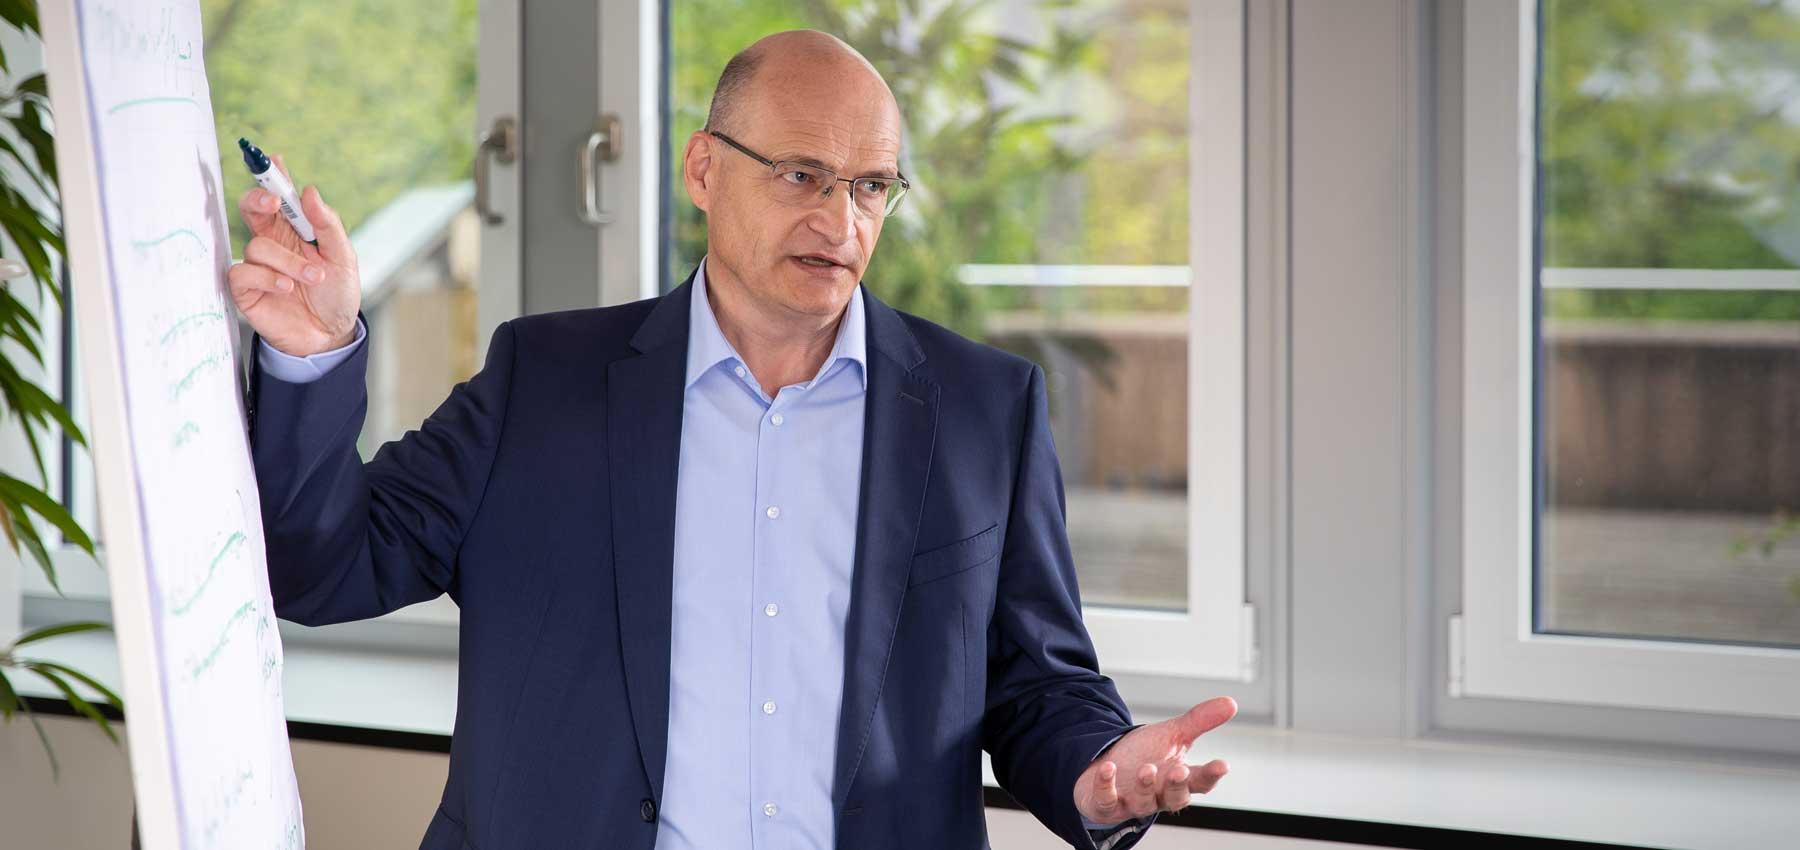 Dr. Martin Sommer Kandidat Landrat parteilos Vortrag